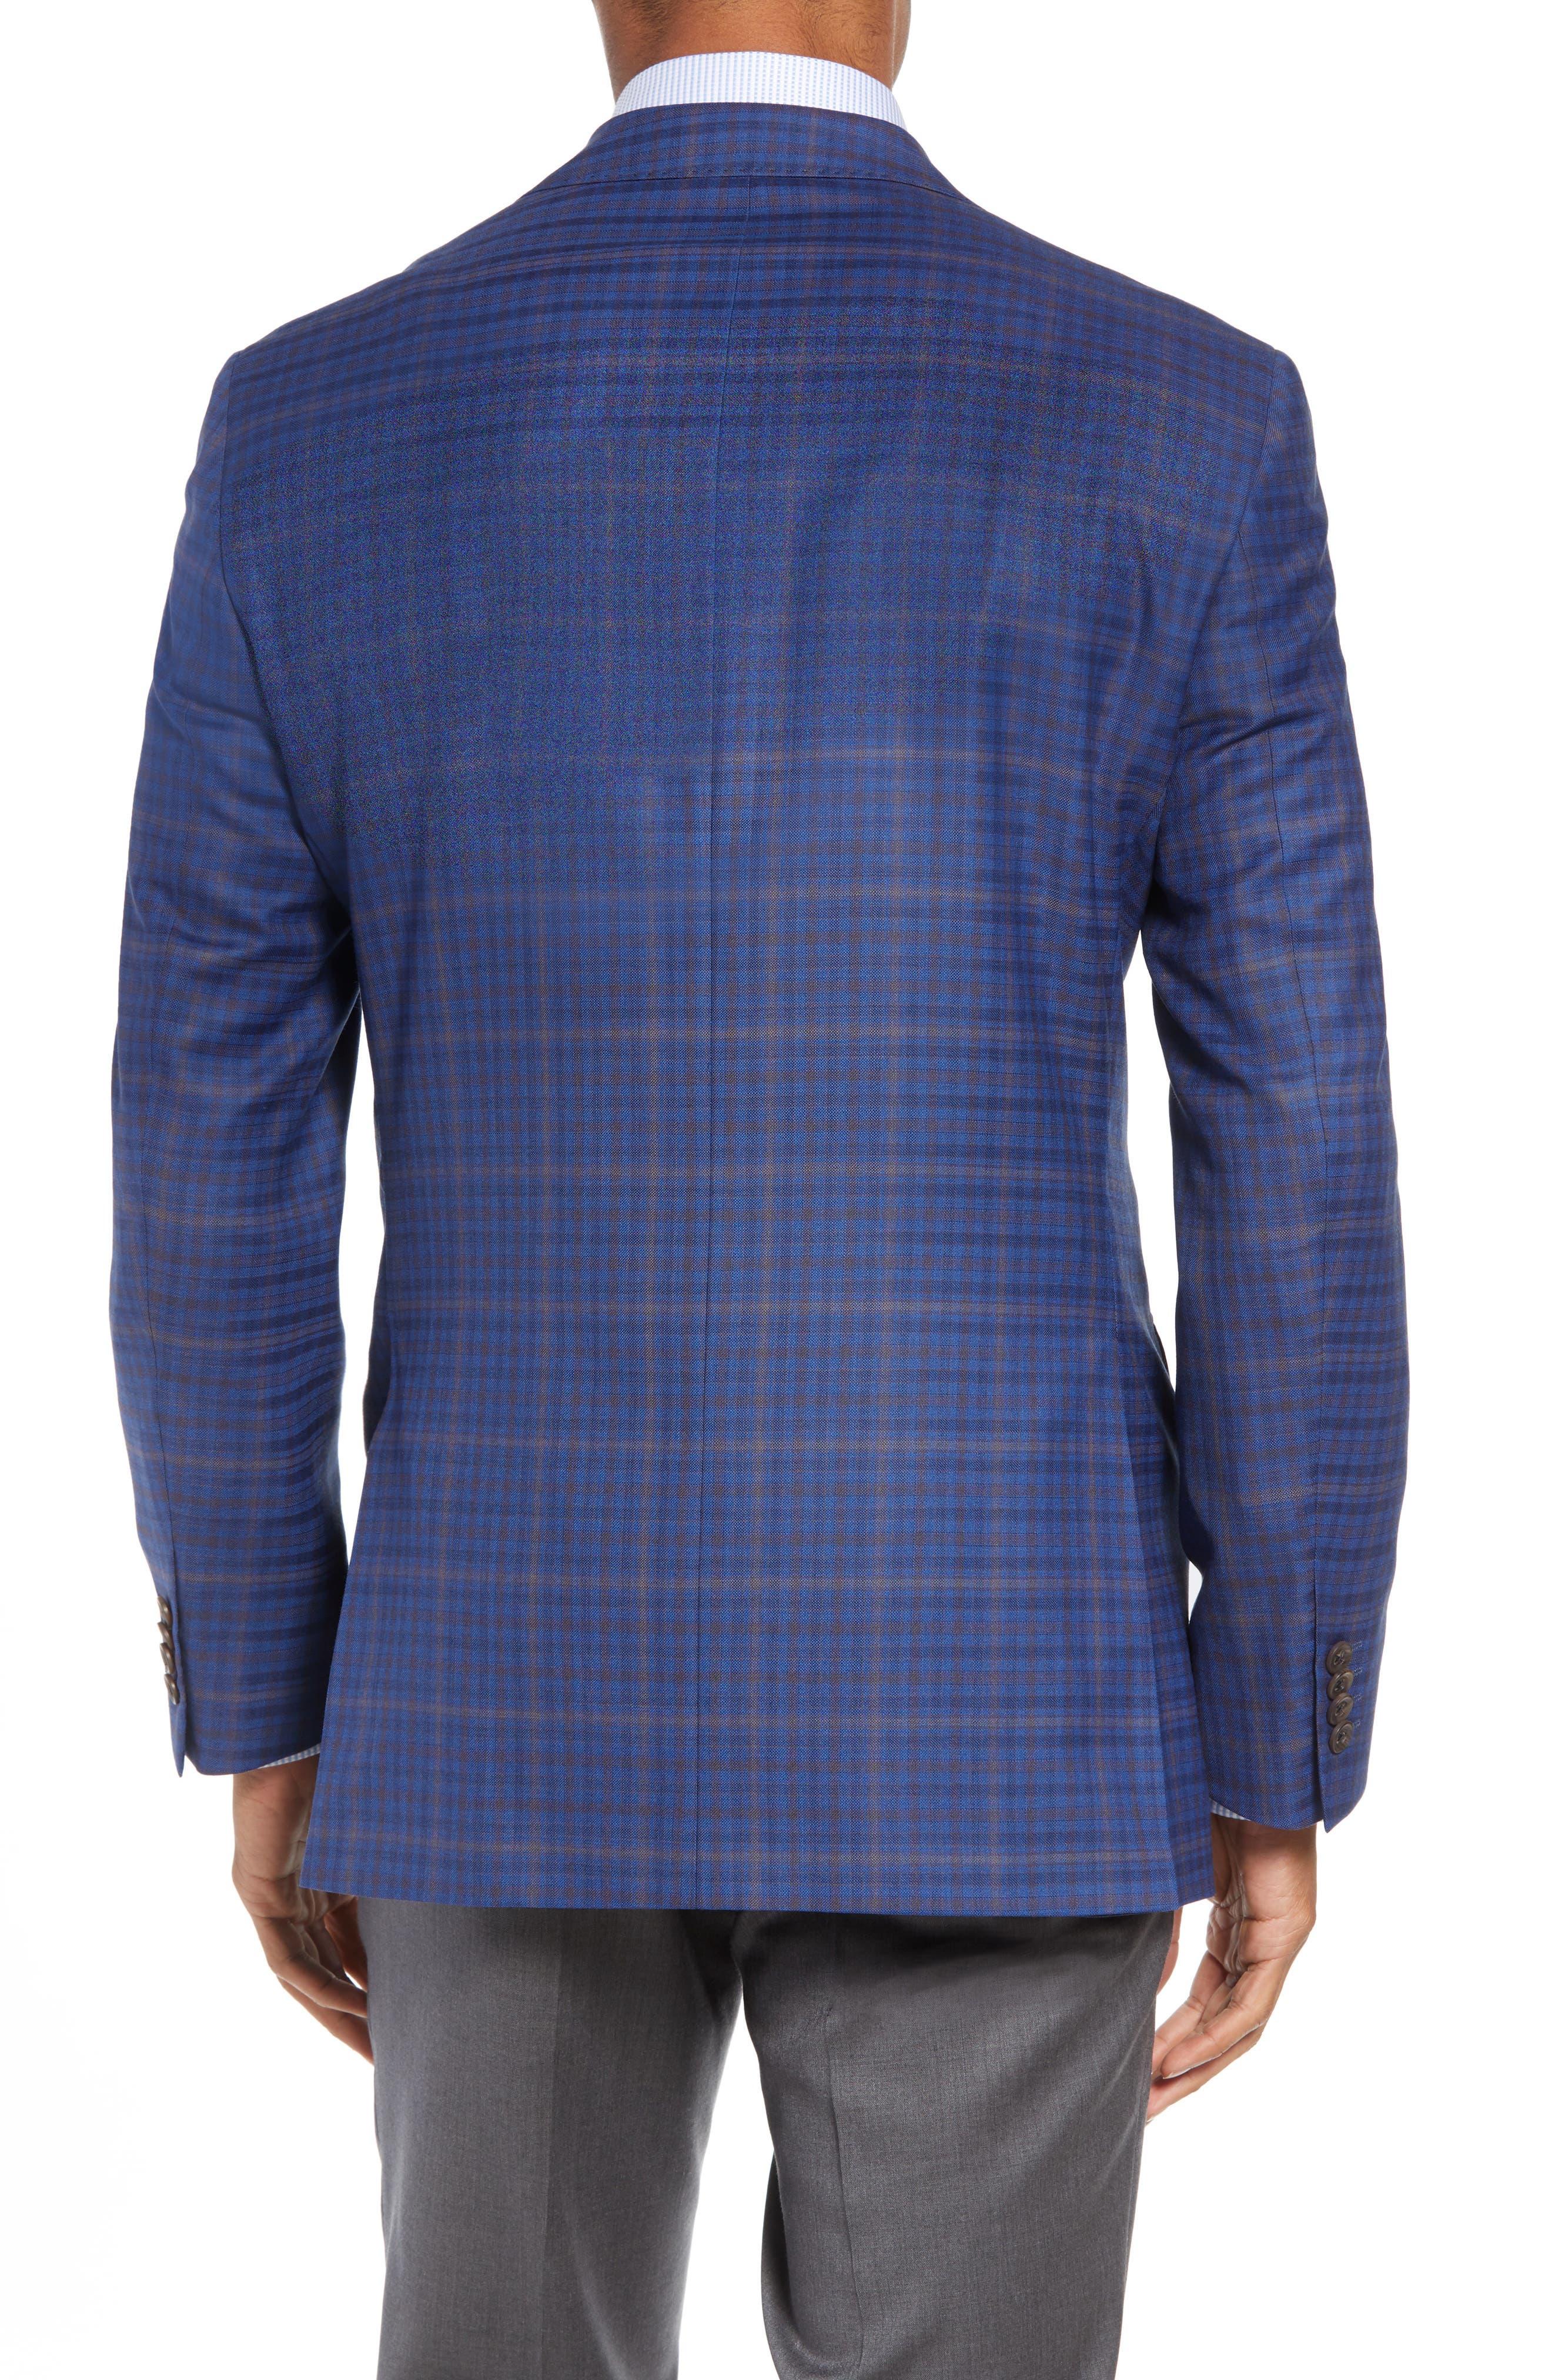 DAVID DONAHUE,                             Connor Classic Fit Plaid Wool Sport Coat,                             Alternate thumbnail 2, color,                             400